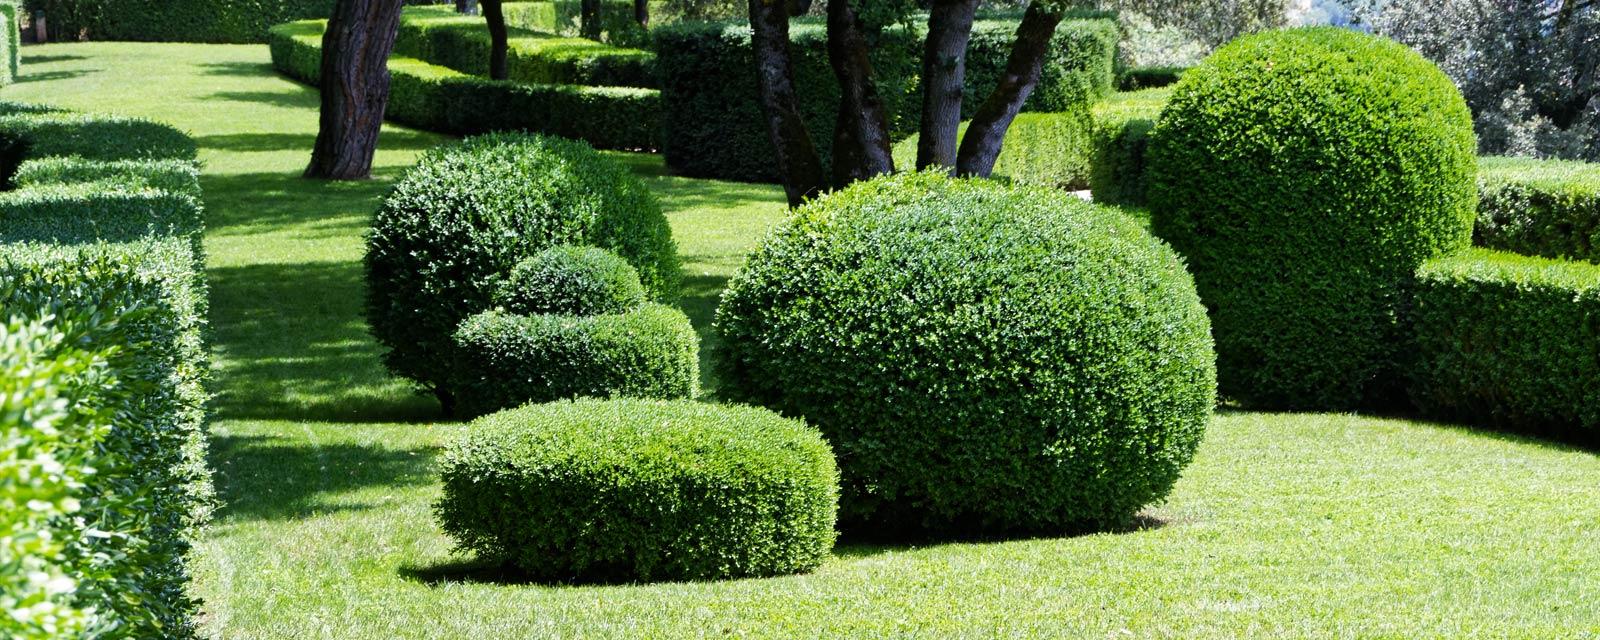 A Quelle Periode Tailler Les Lauriers quand et comment tailler ses arbustes ? | guide artisan